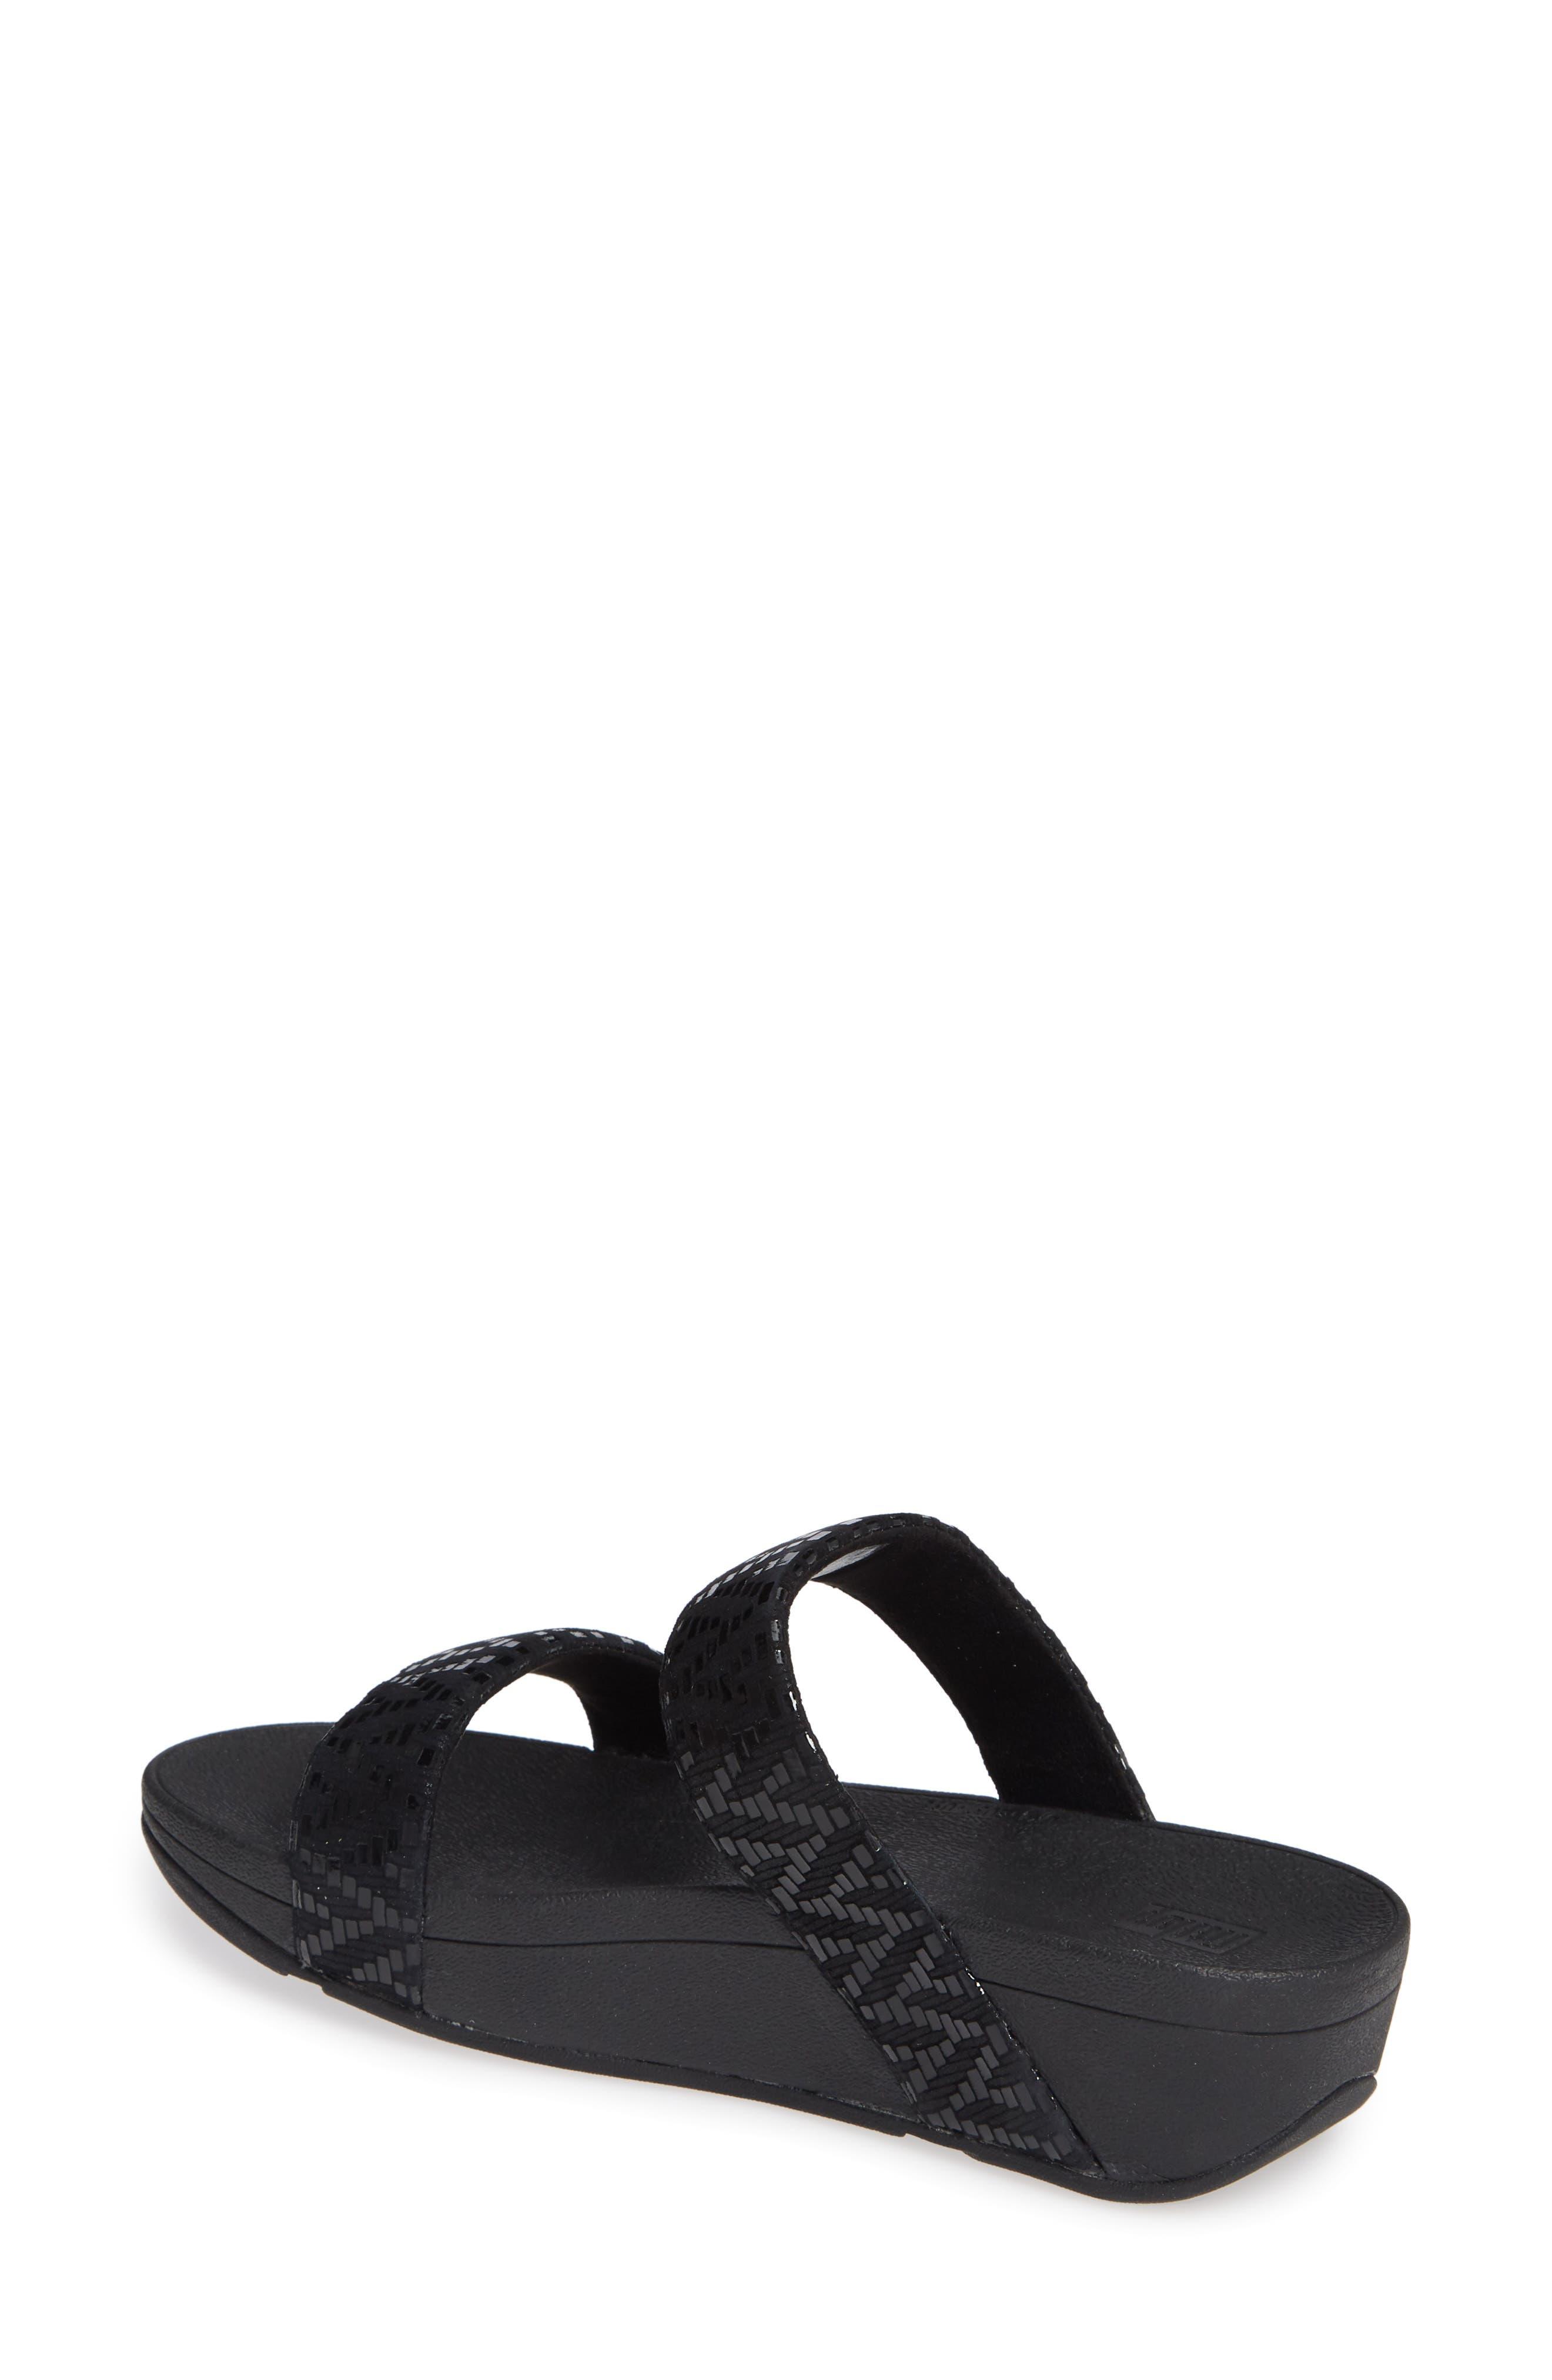 FITFLOP, Lottie Chevron Wedge Slide Sandal, Alternate thumbnail 2, color, BLACK FABRIC